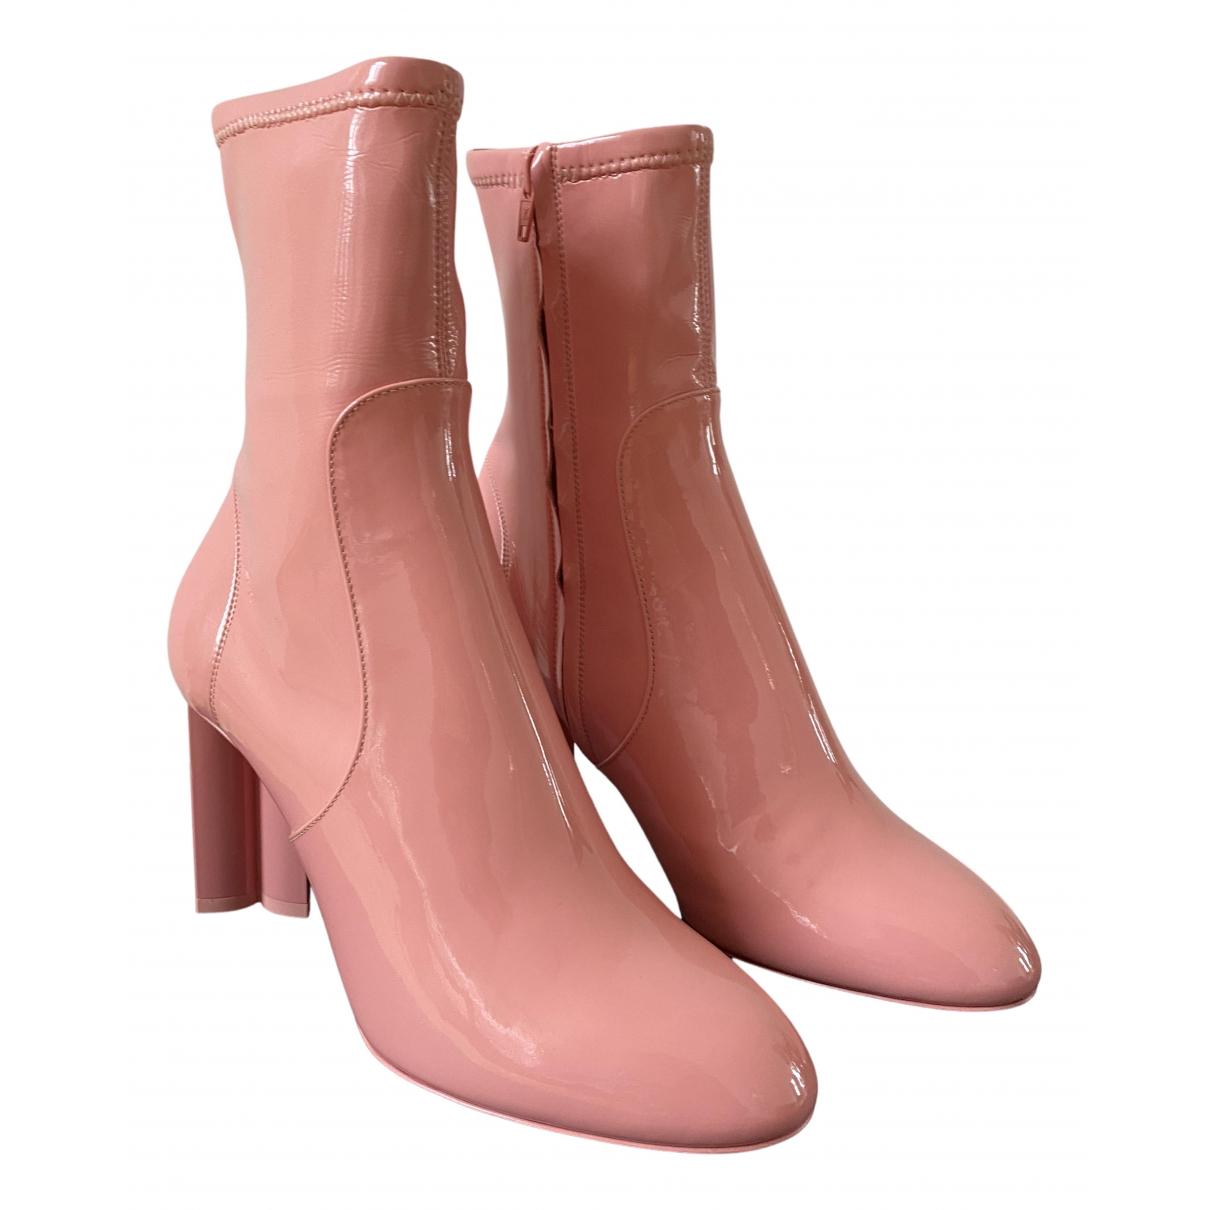 Louis Vuitton \N Stiefel in  Rosa Lackleder